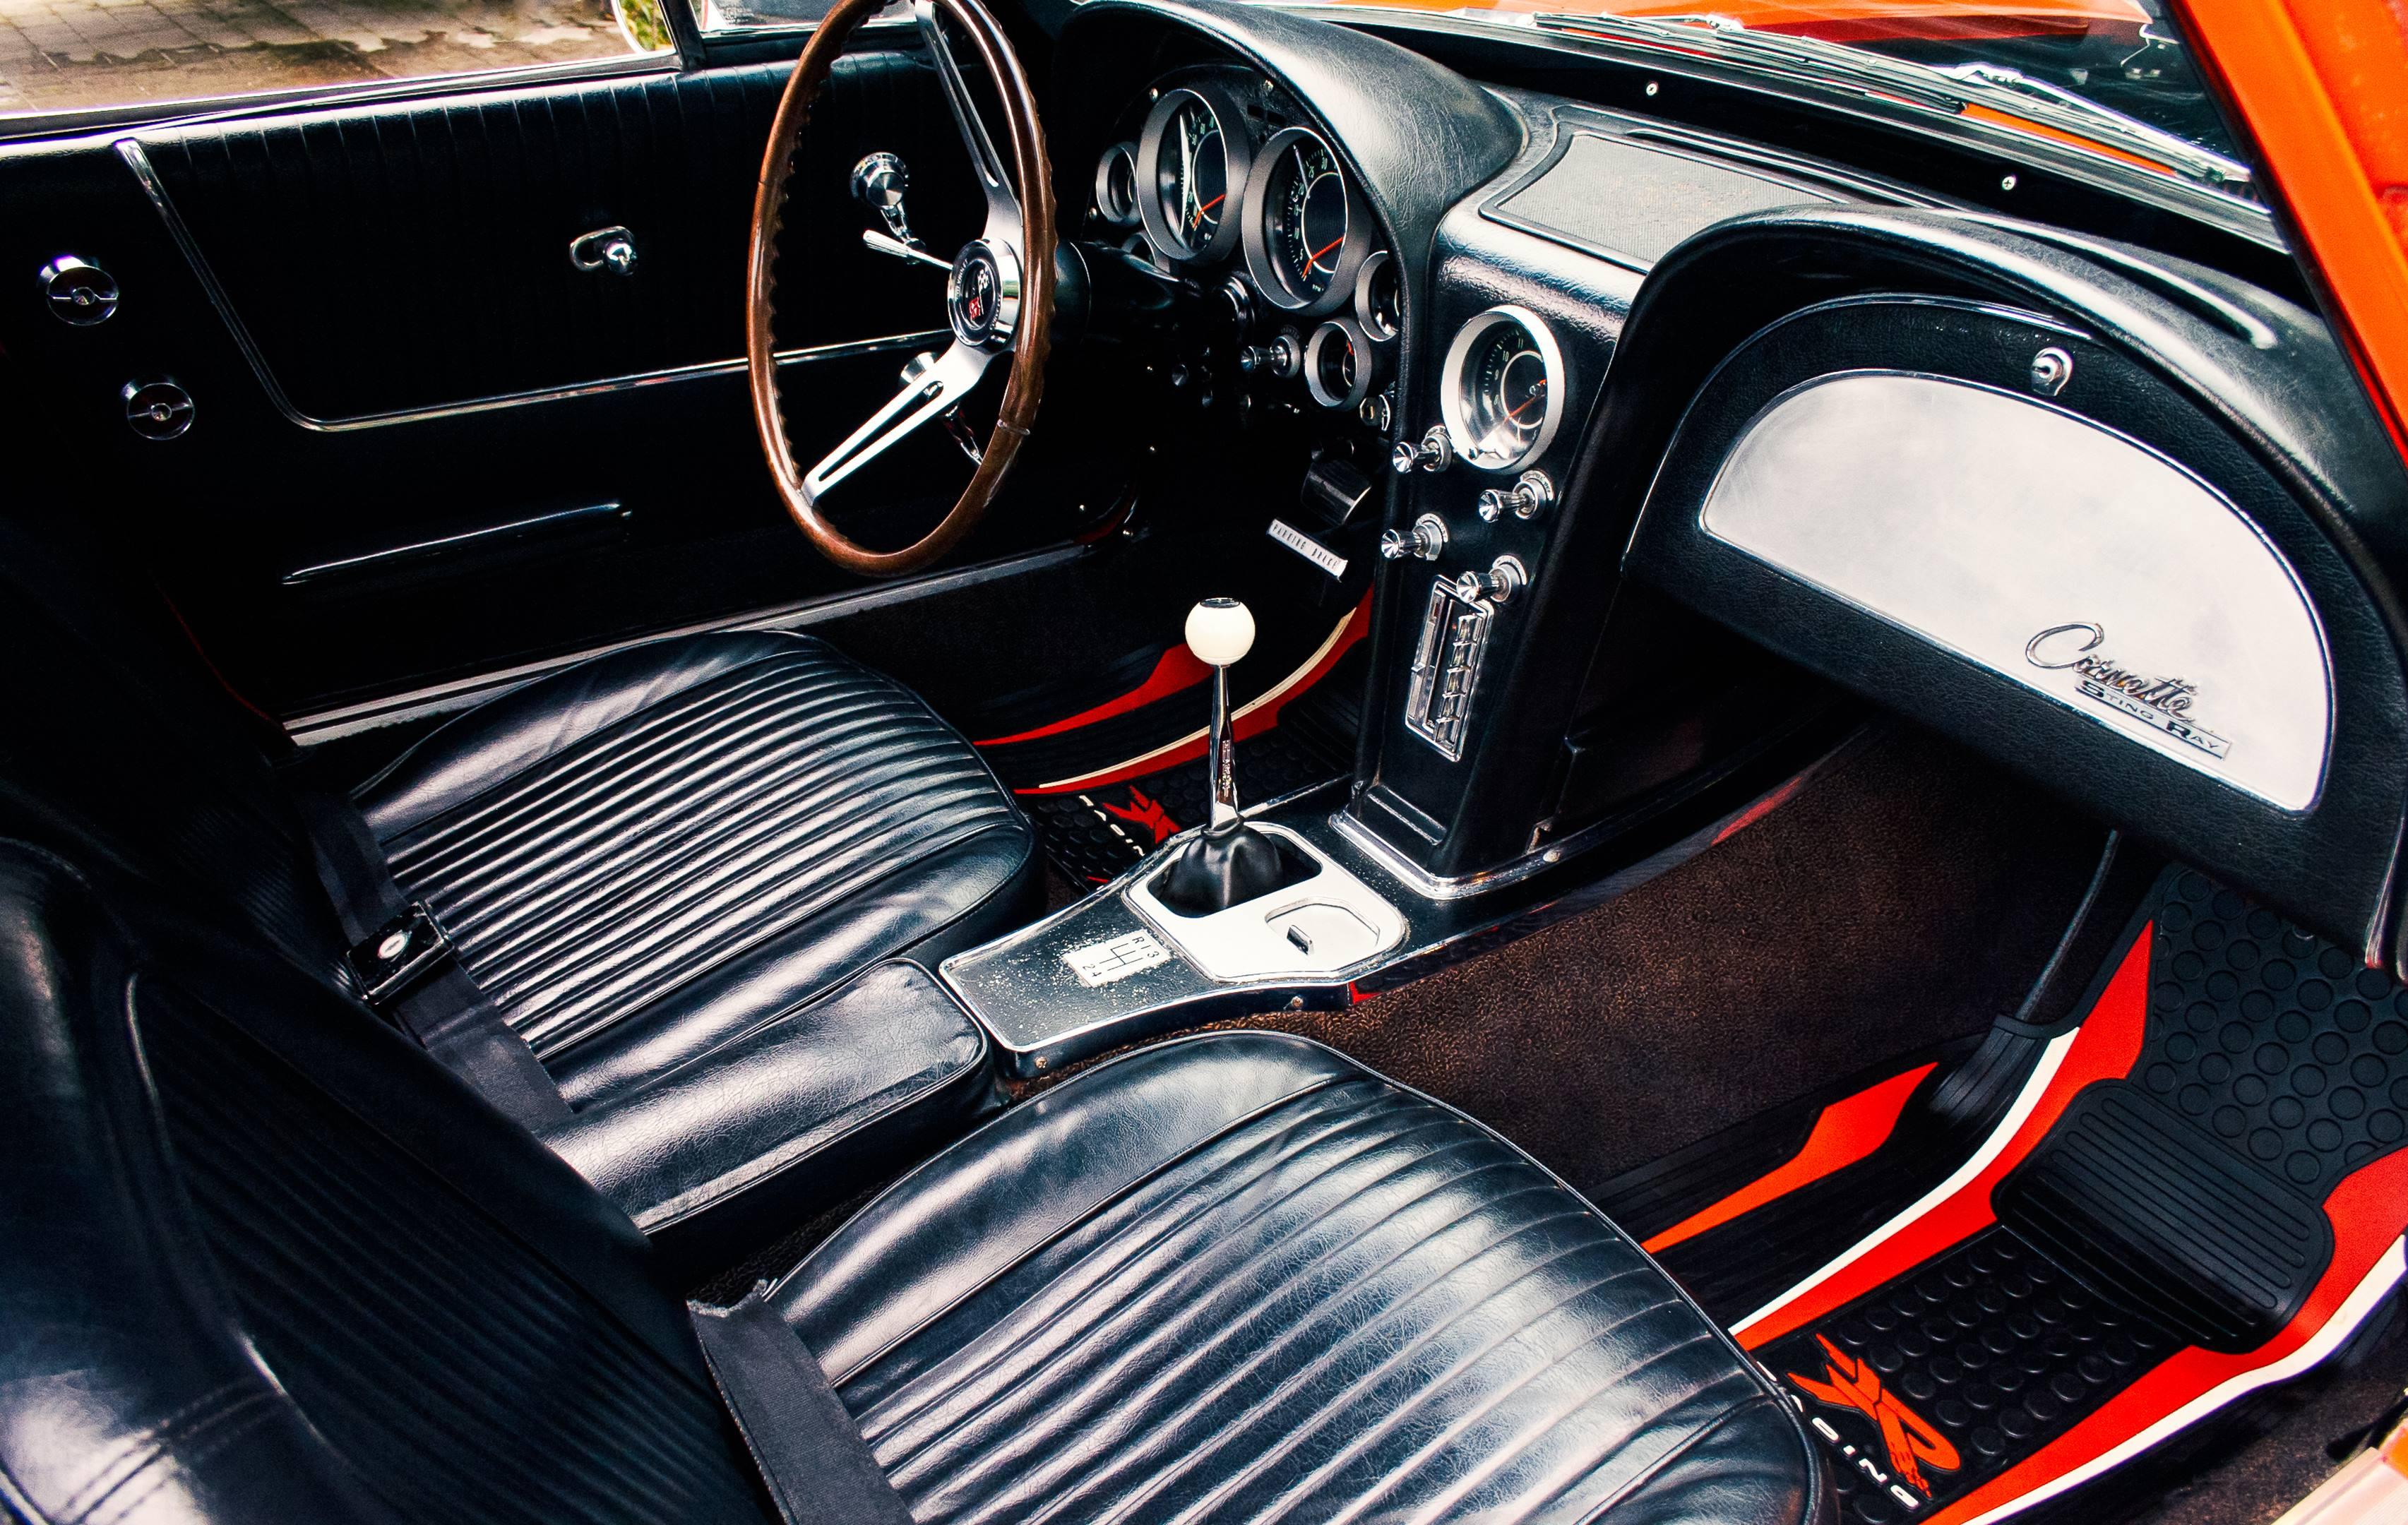 1964 Chevrolet Corvette interior